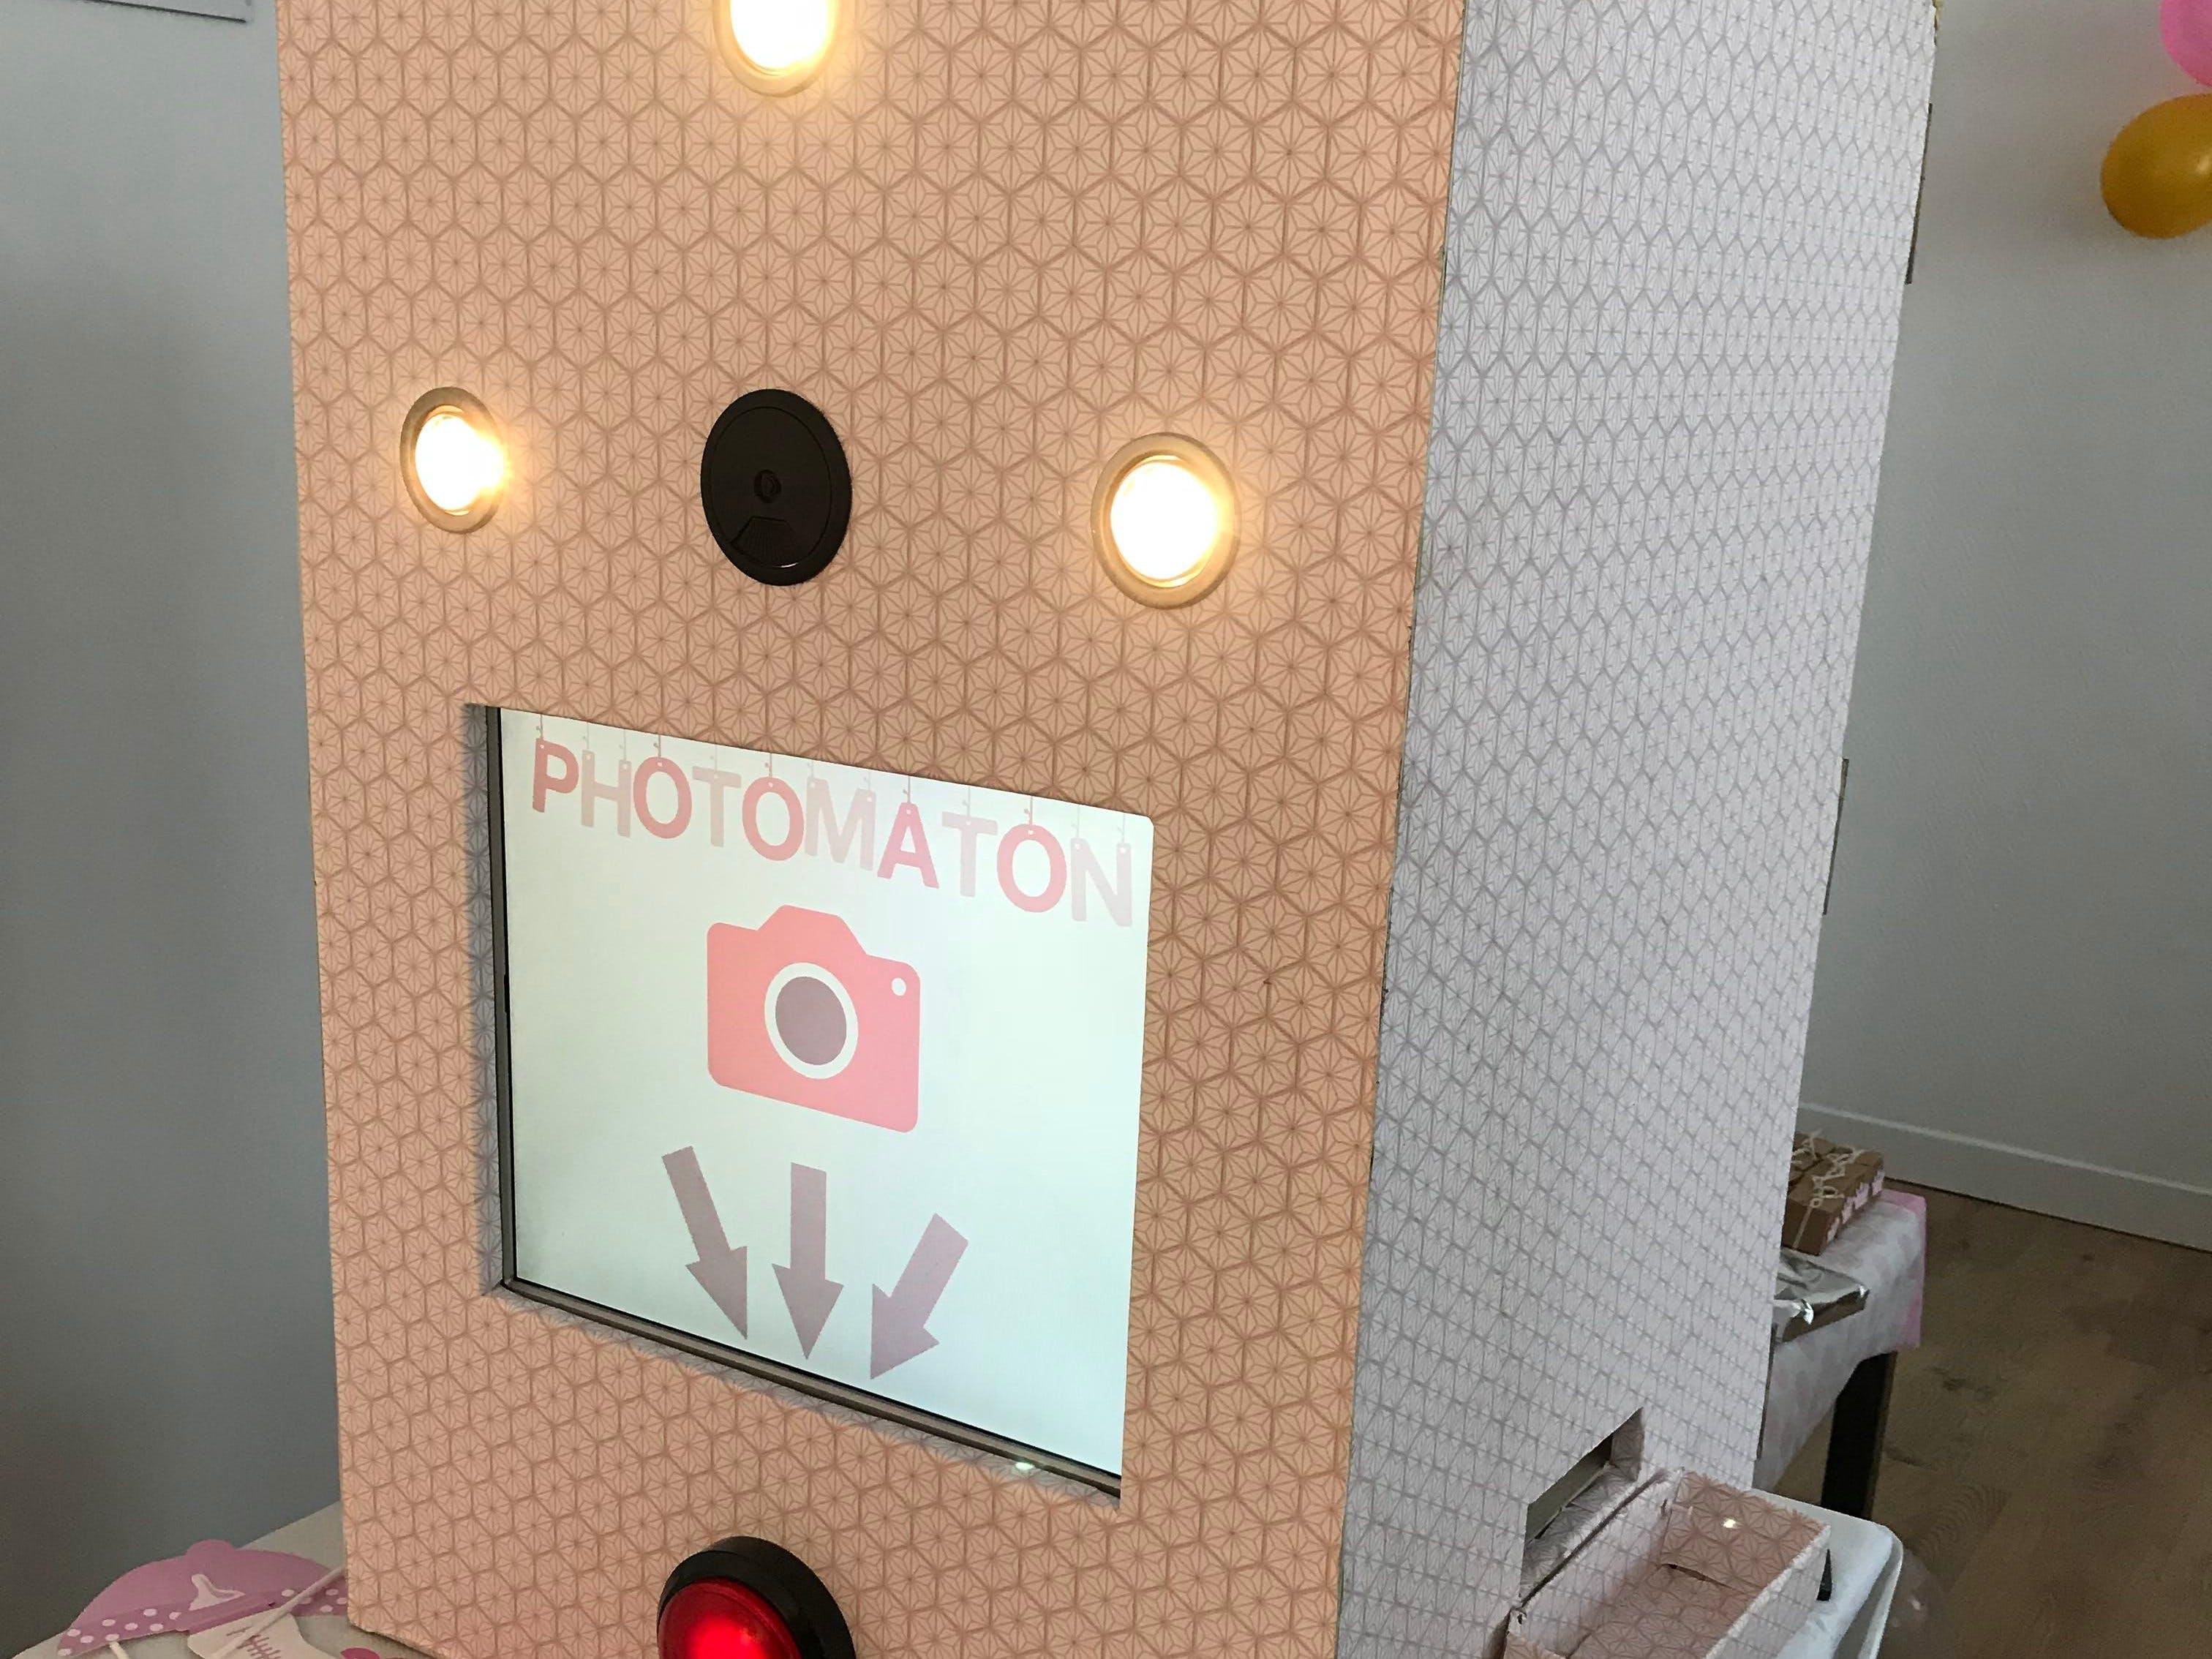 Wedding Photo Booth with Raspberry Pi